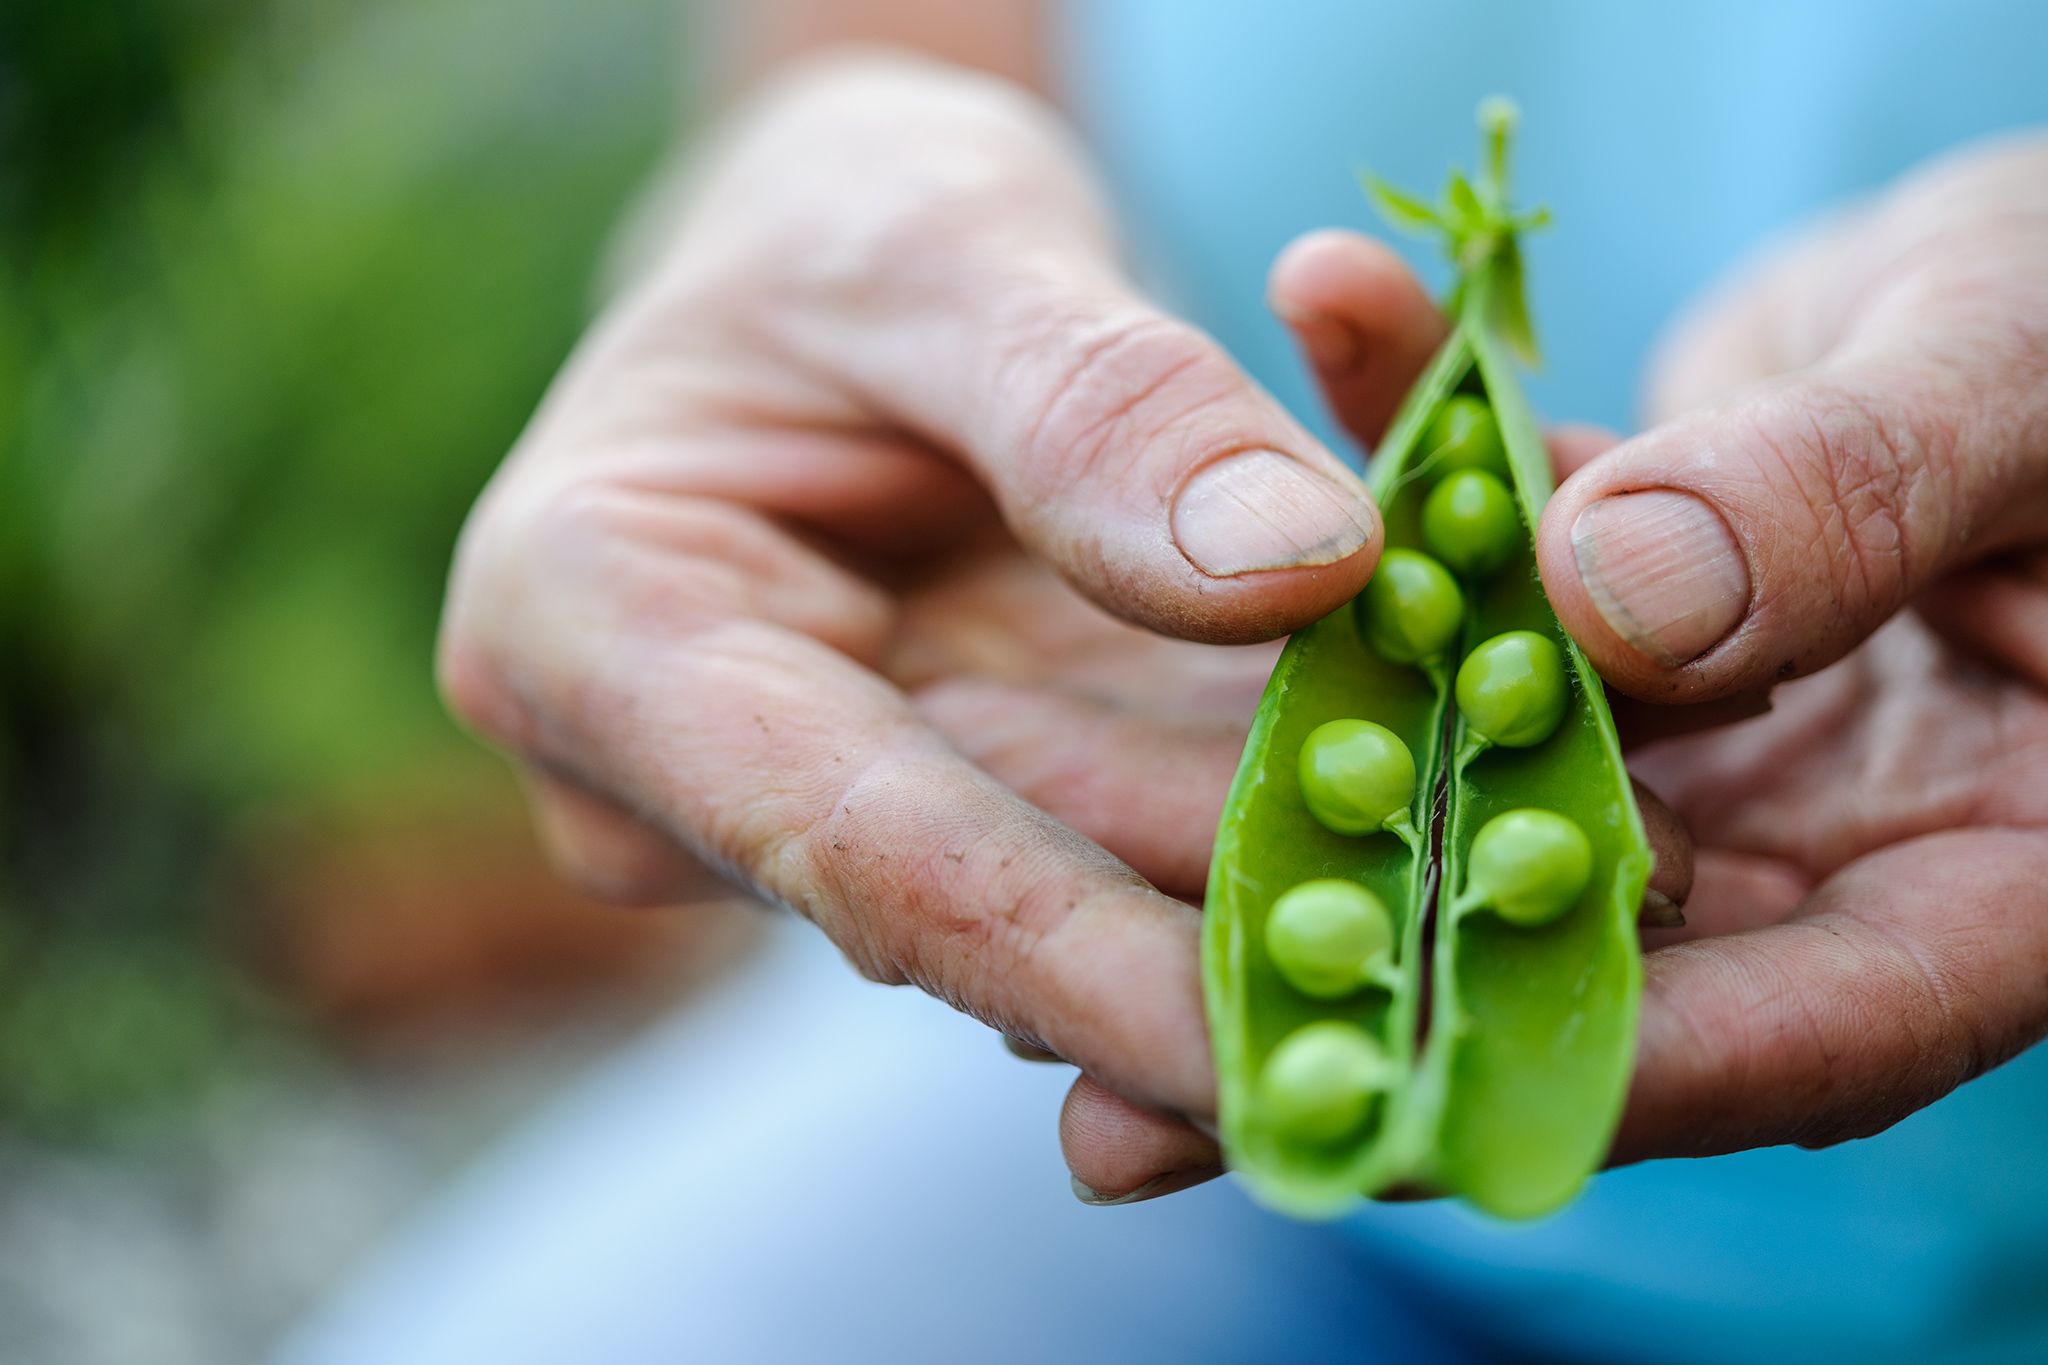 Open pod of peas in hand